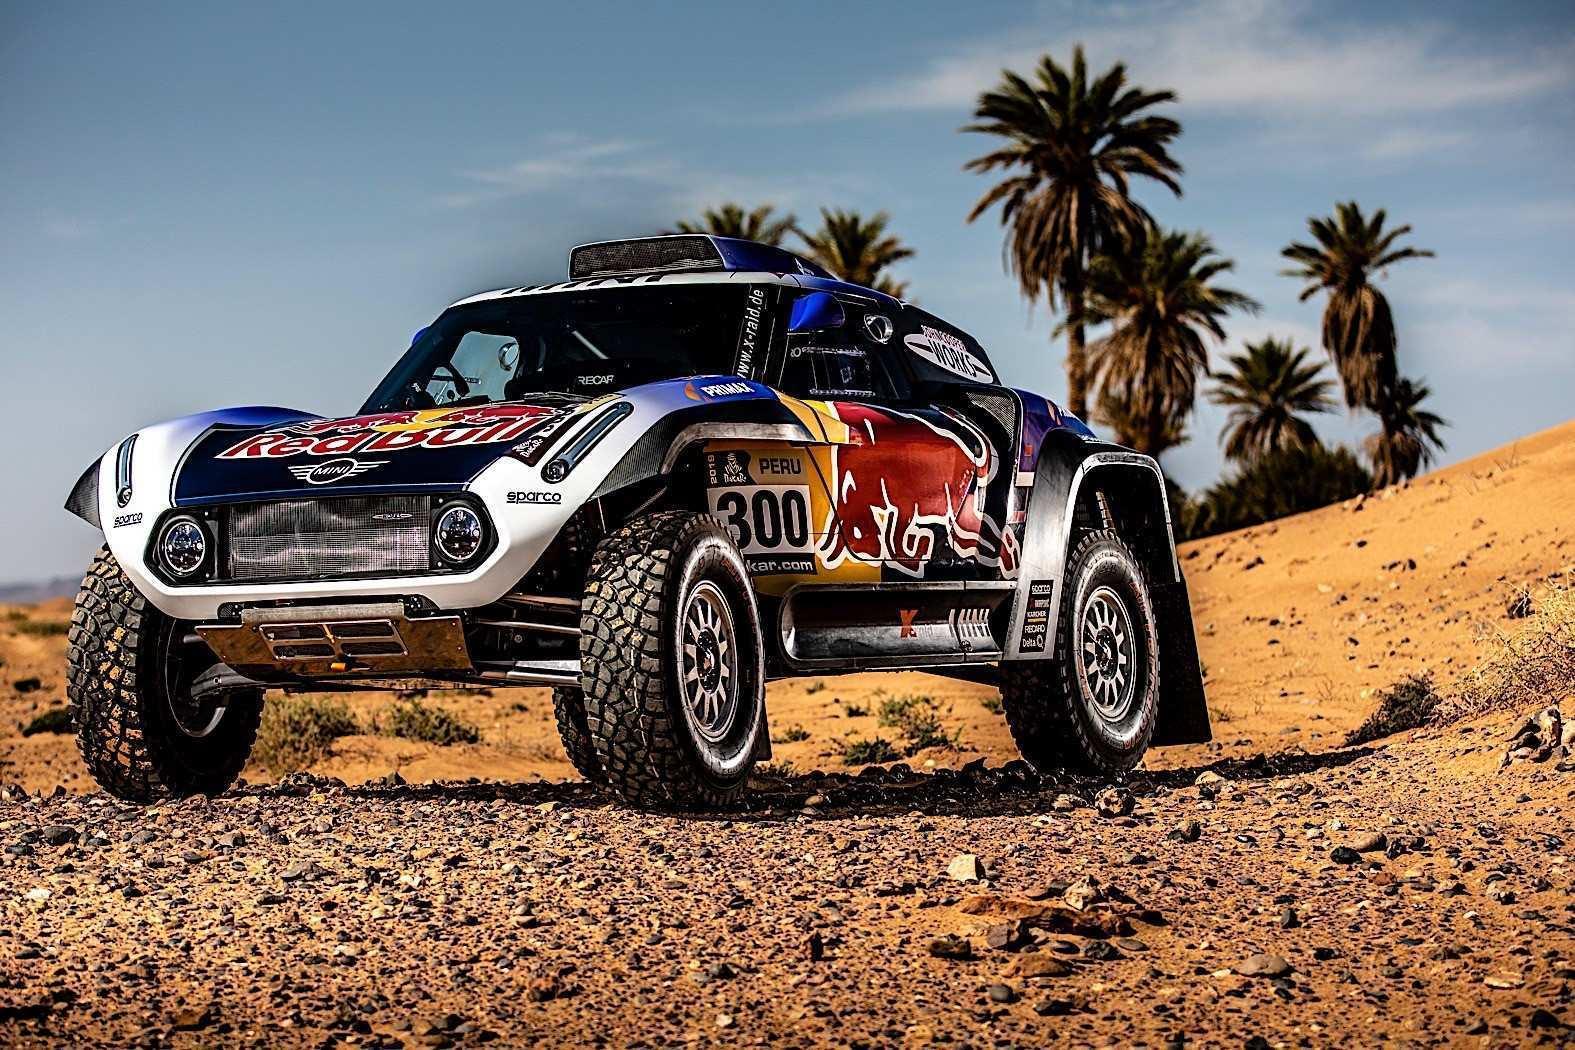 35 Gallery of Peugeot Dakar 2019 Picture with Peugeot Dakar 2019